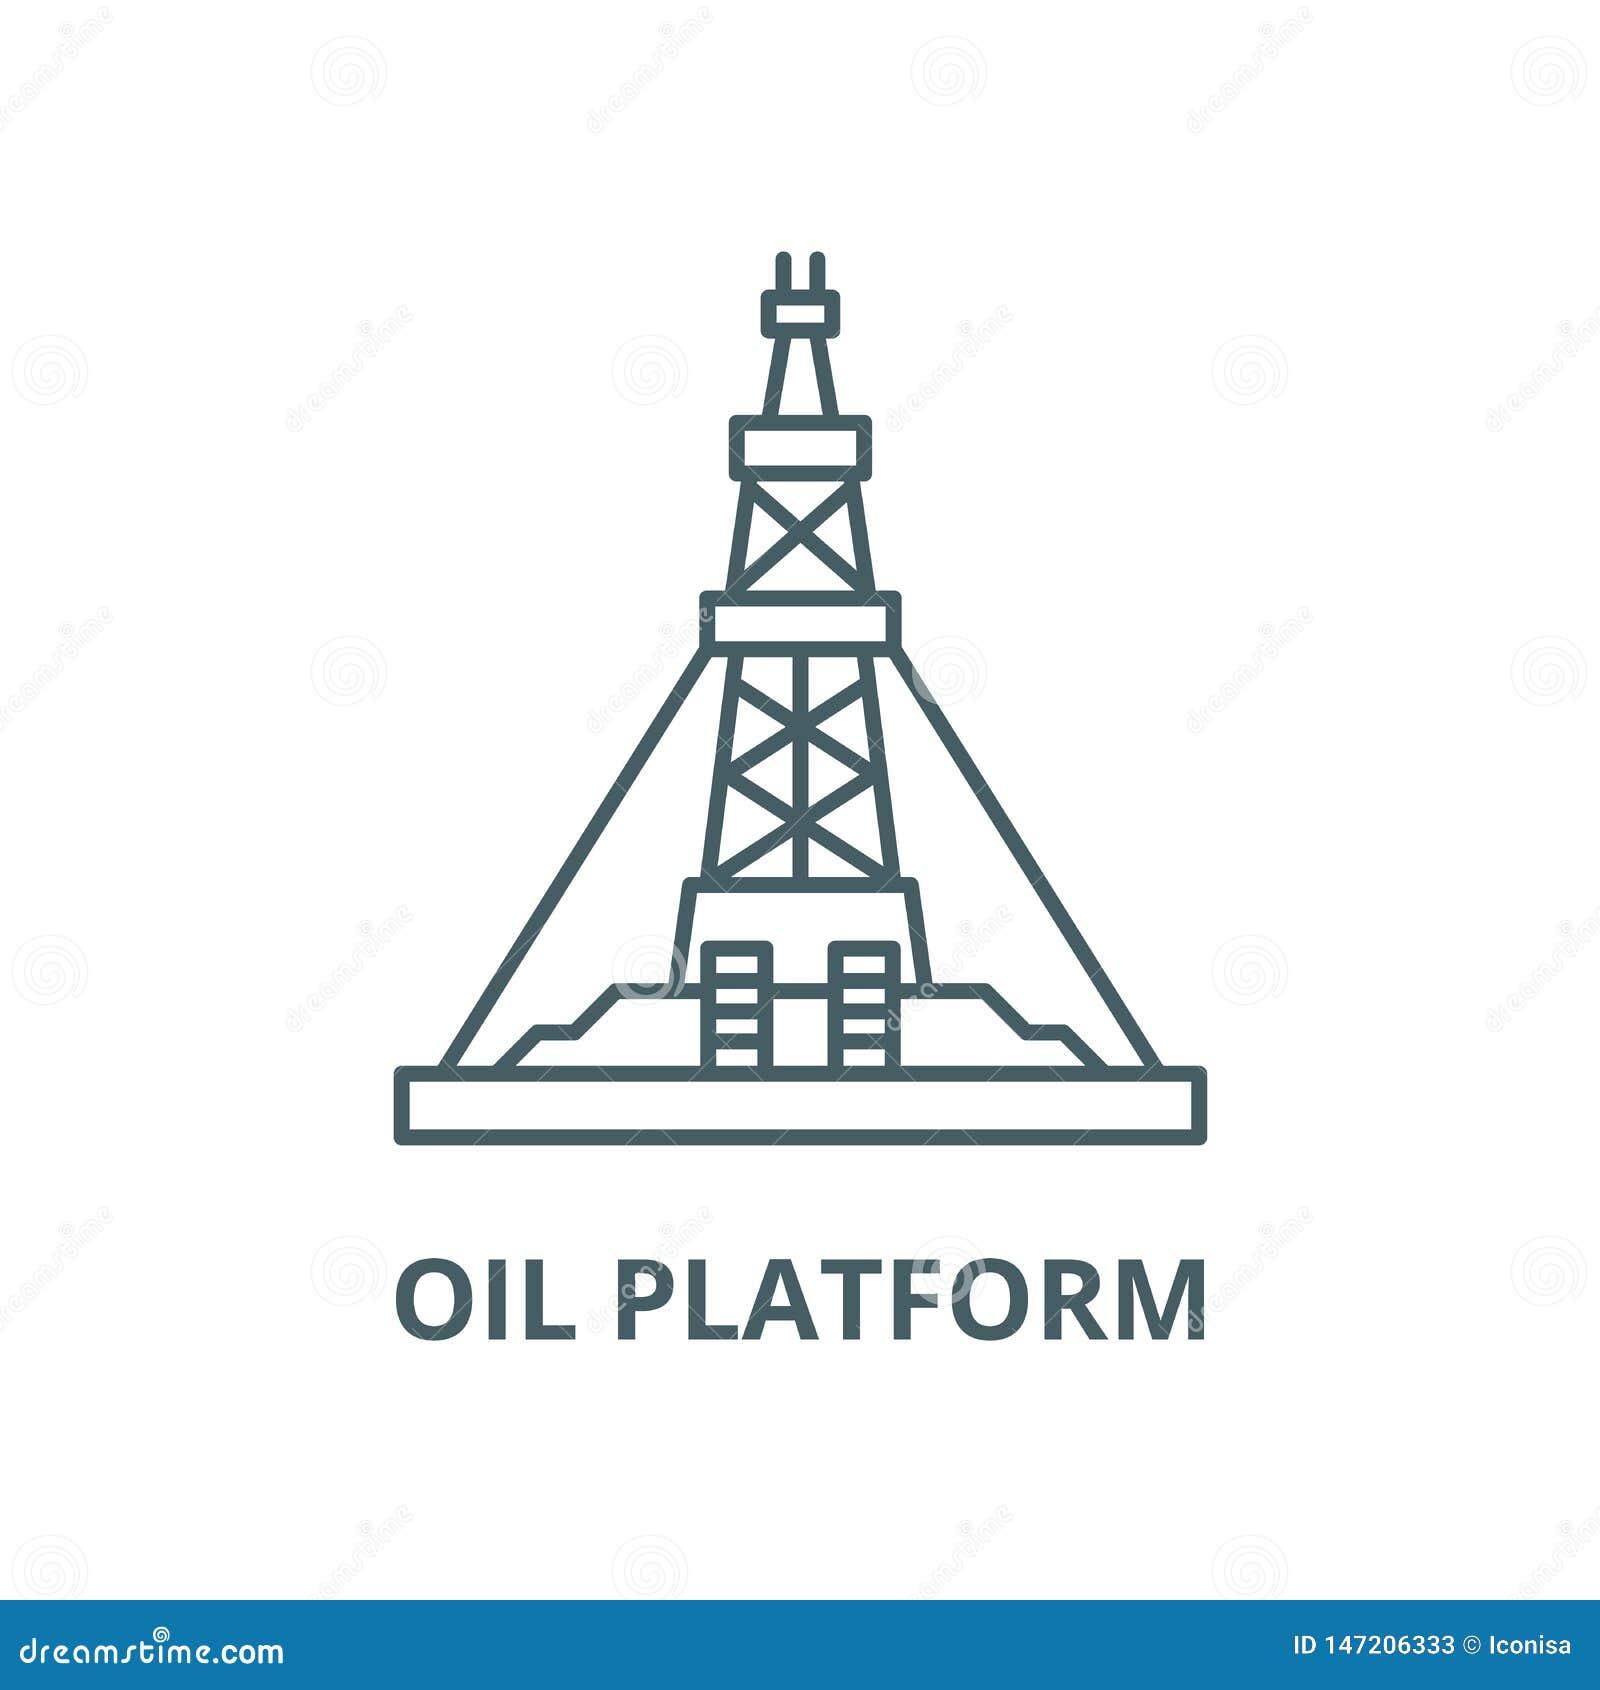 Oil production platform vector line icon, linear concept, outline sign, symbol